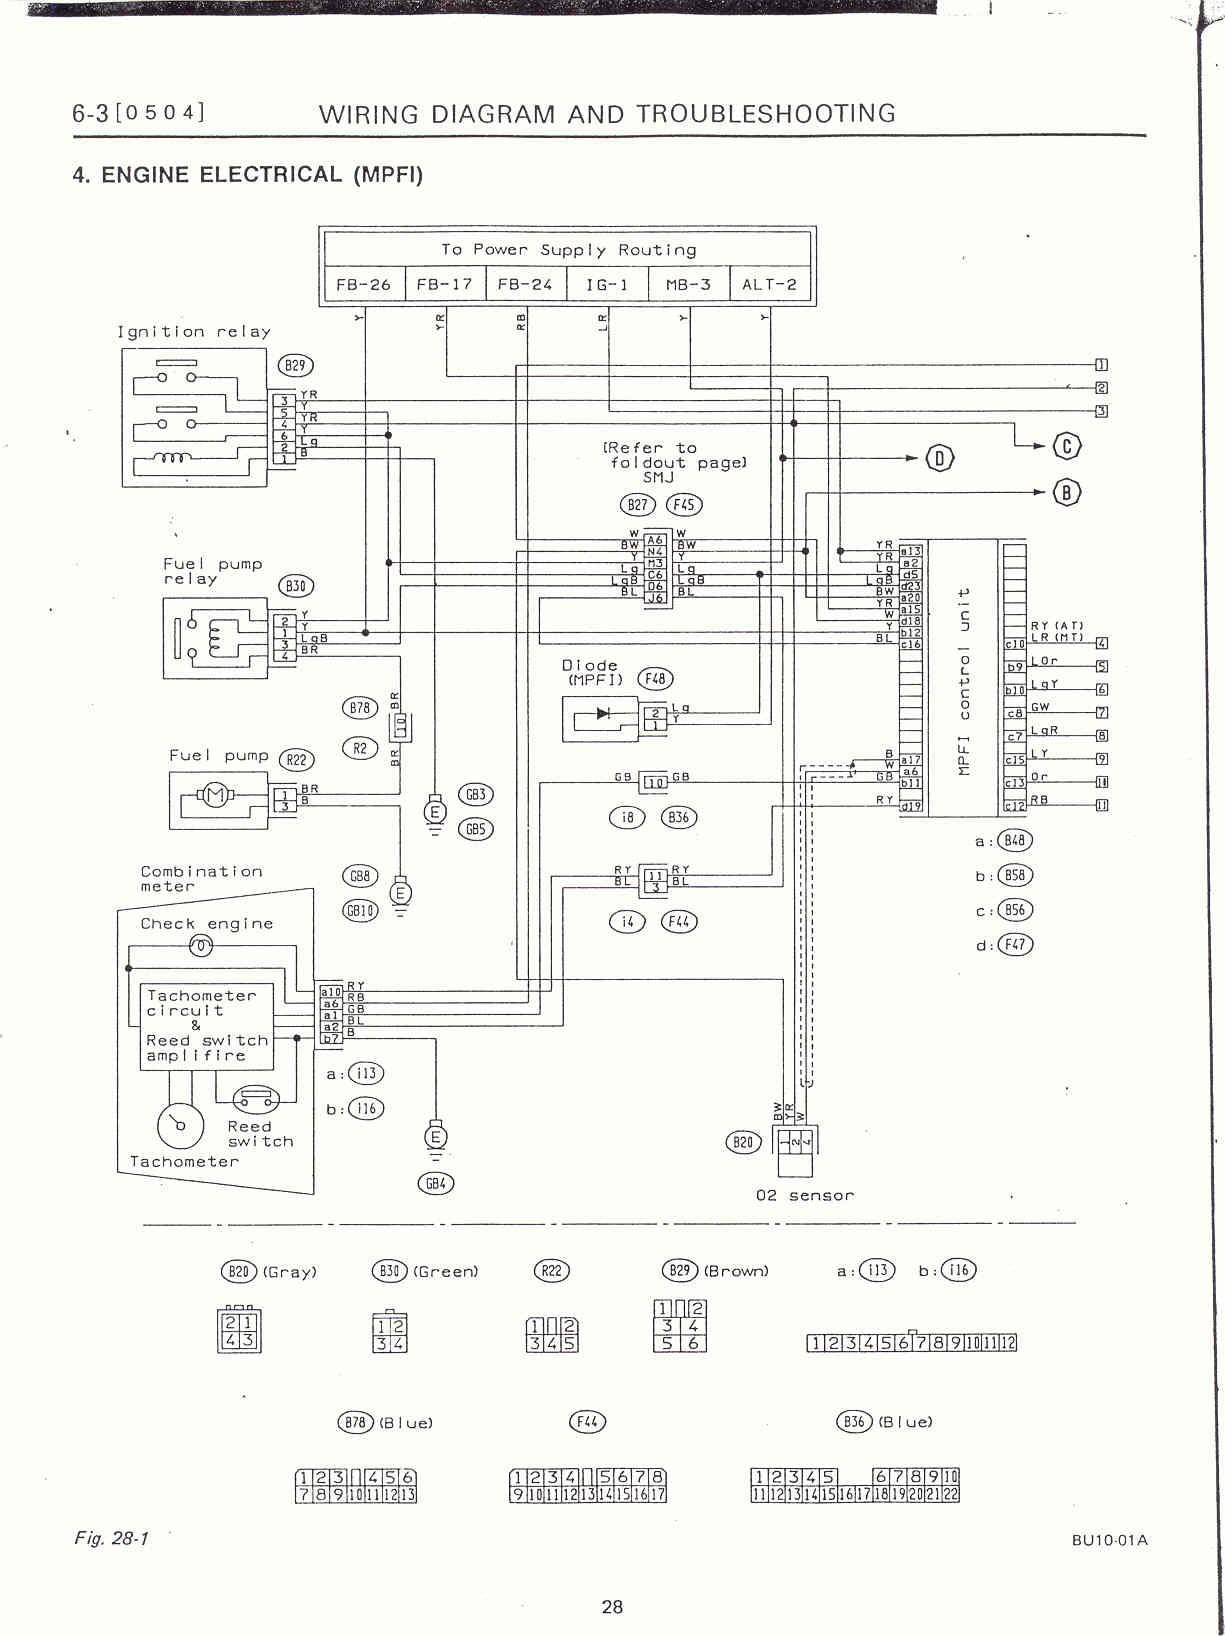 anzo wiring harness diagram